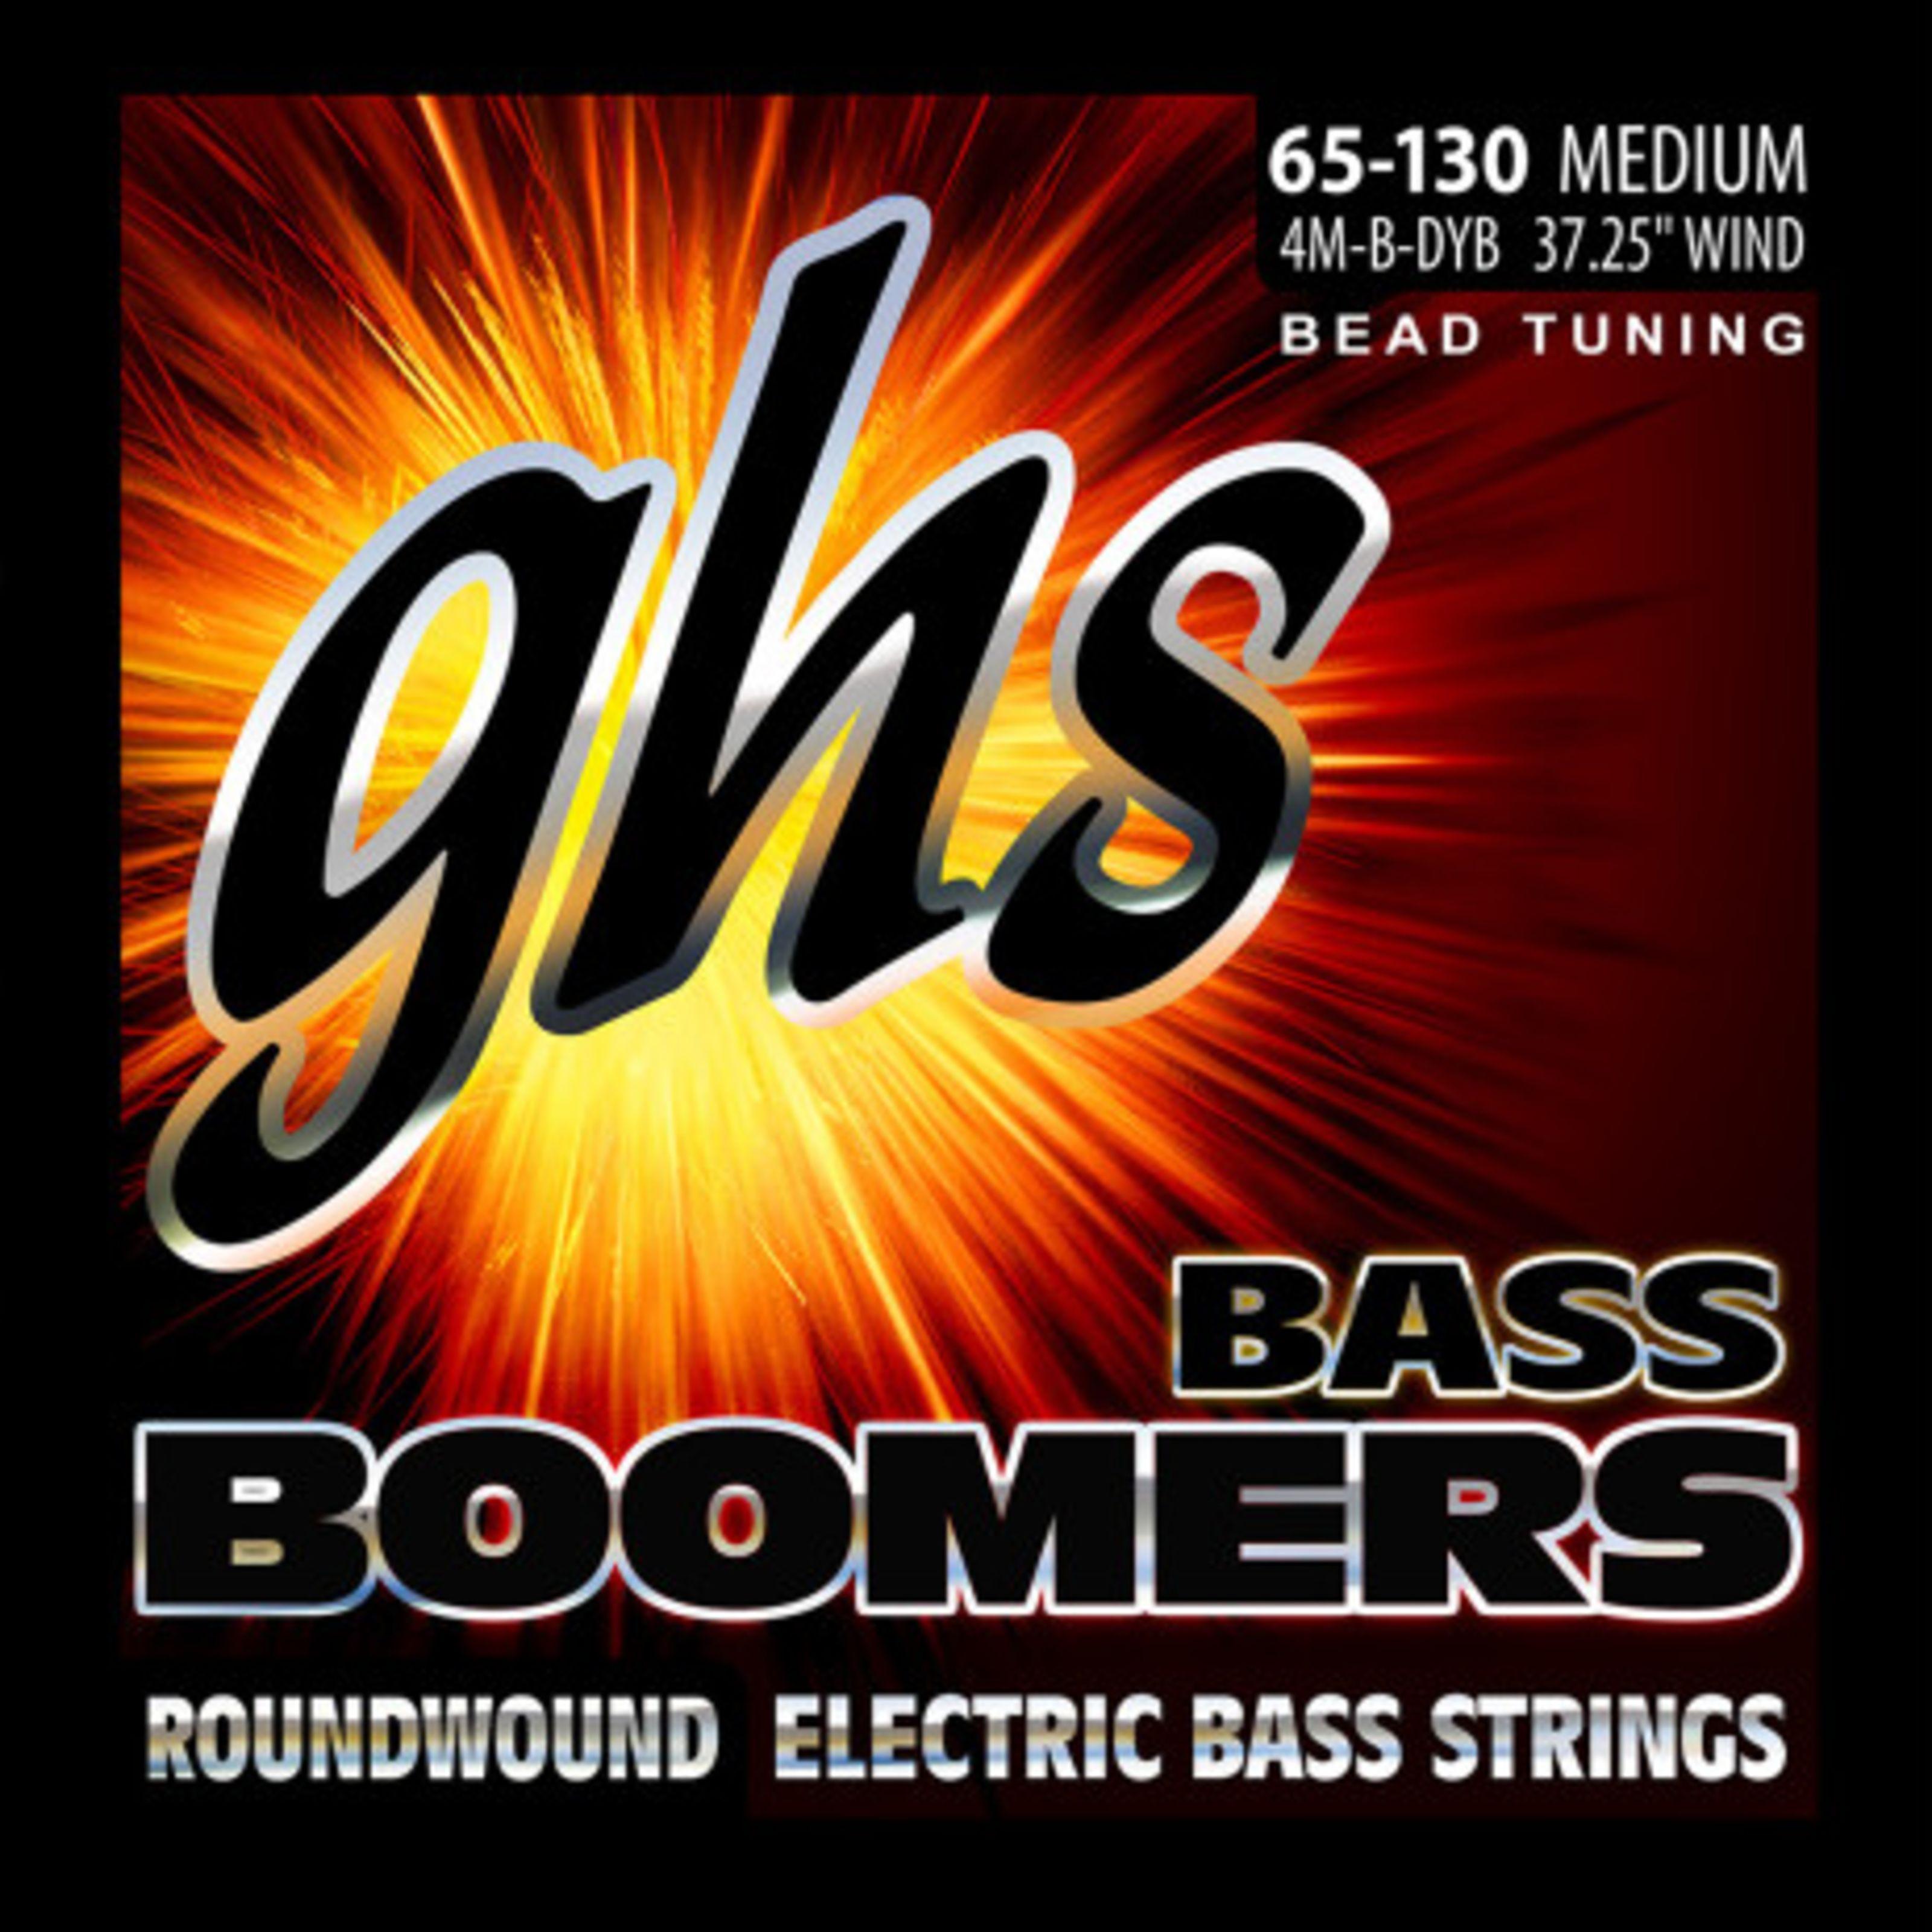 GHS - 4M-B-DYB BEAD Tuned Bass Boomers GHS 3045 4/M B DYB